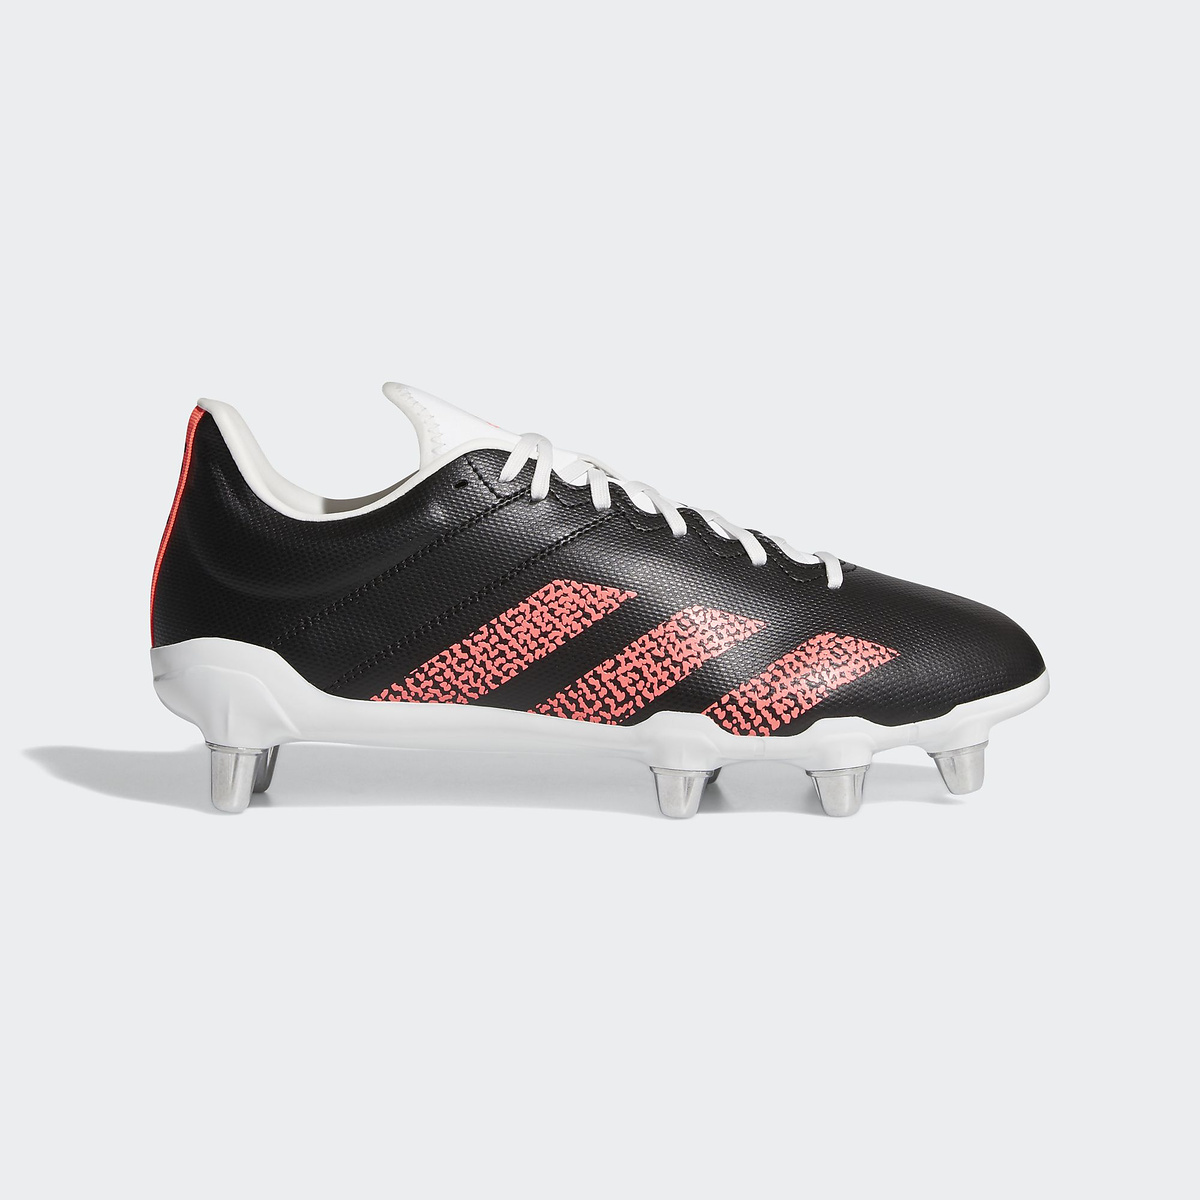 adidas (アディダス) KAKARI (SG) その他競技 体育器具 ラグビー メンズ コアブラック/シグナルピンク/クリスタルホワイト JQ137 FU8195